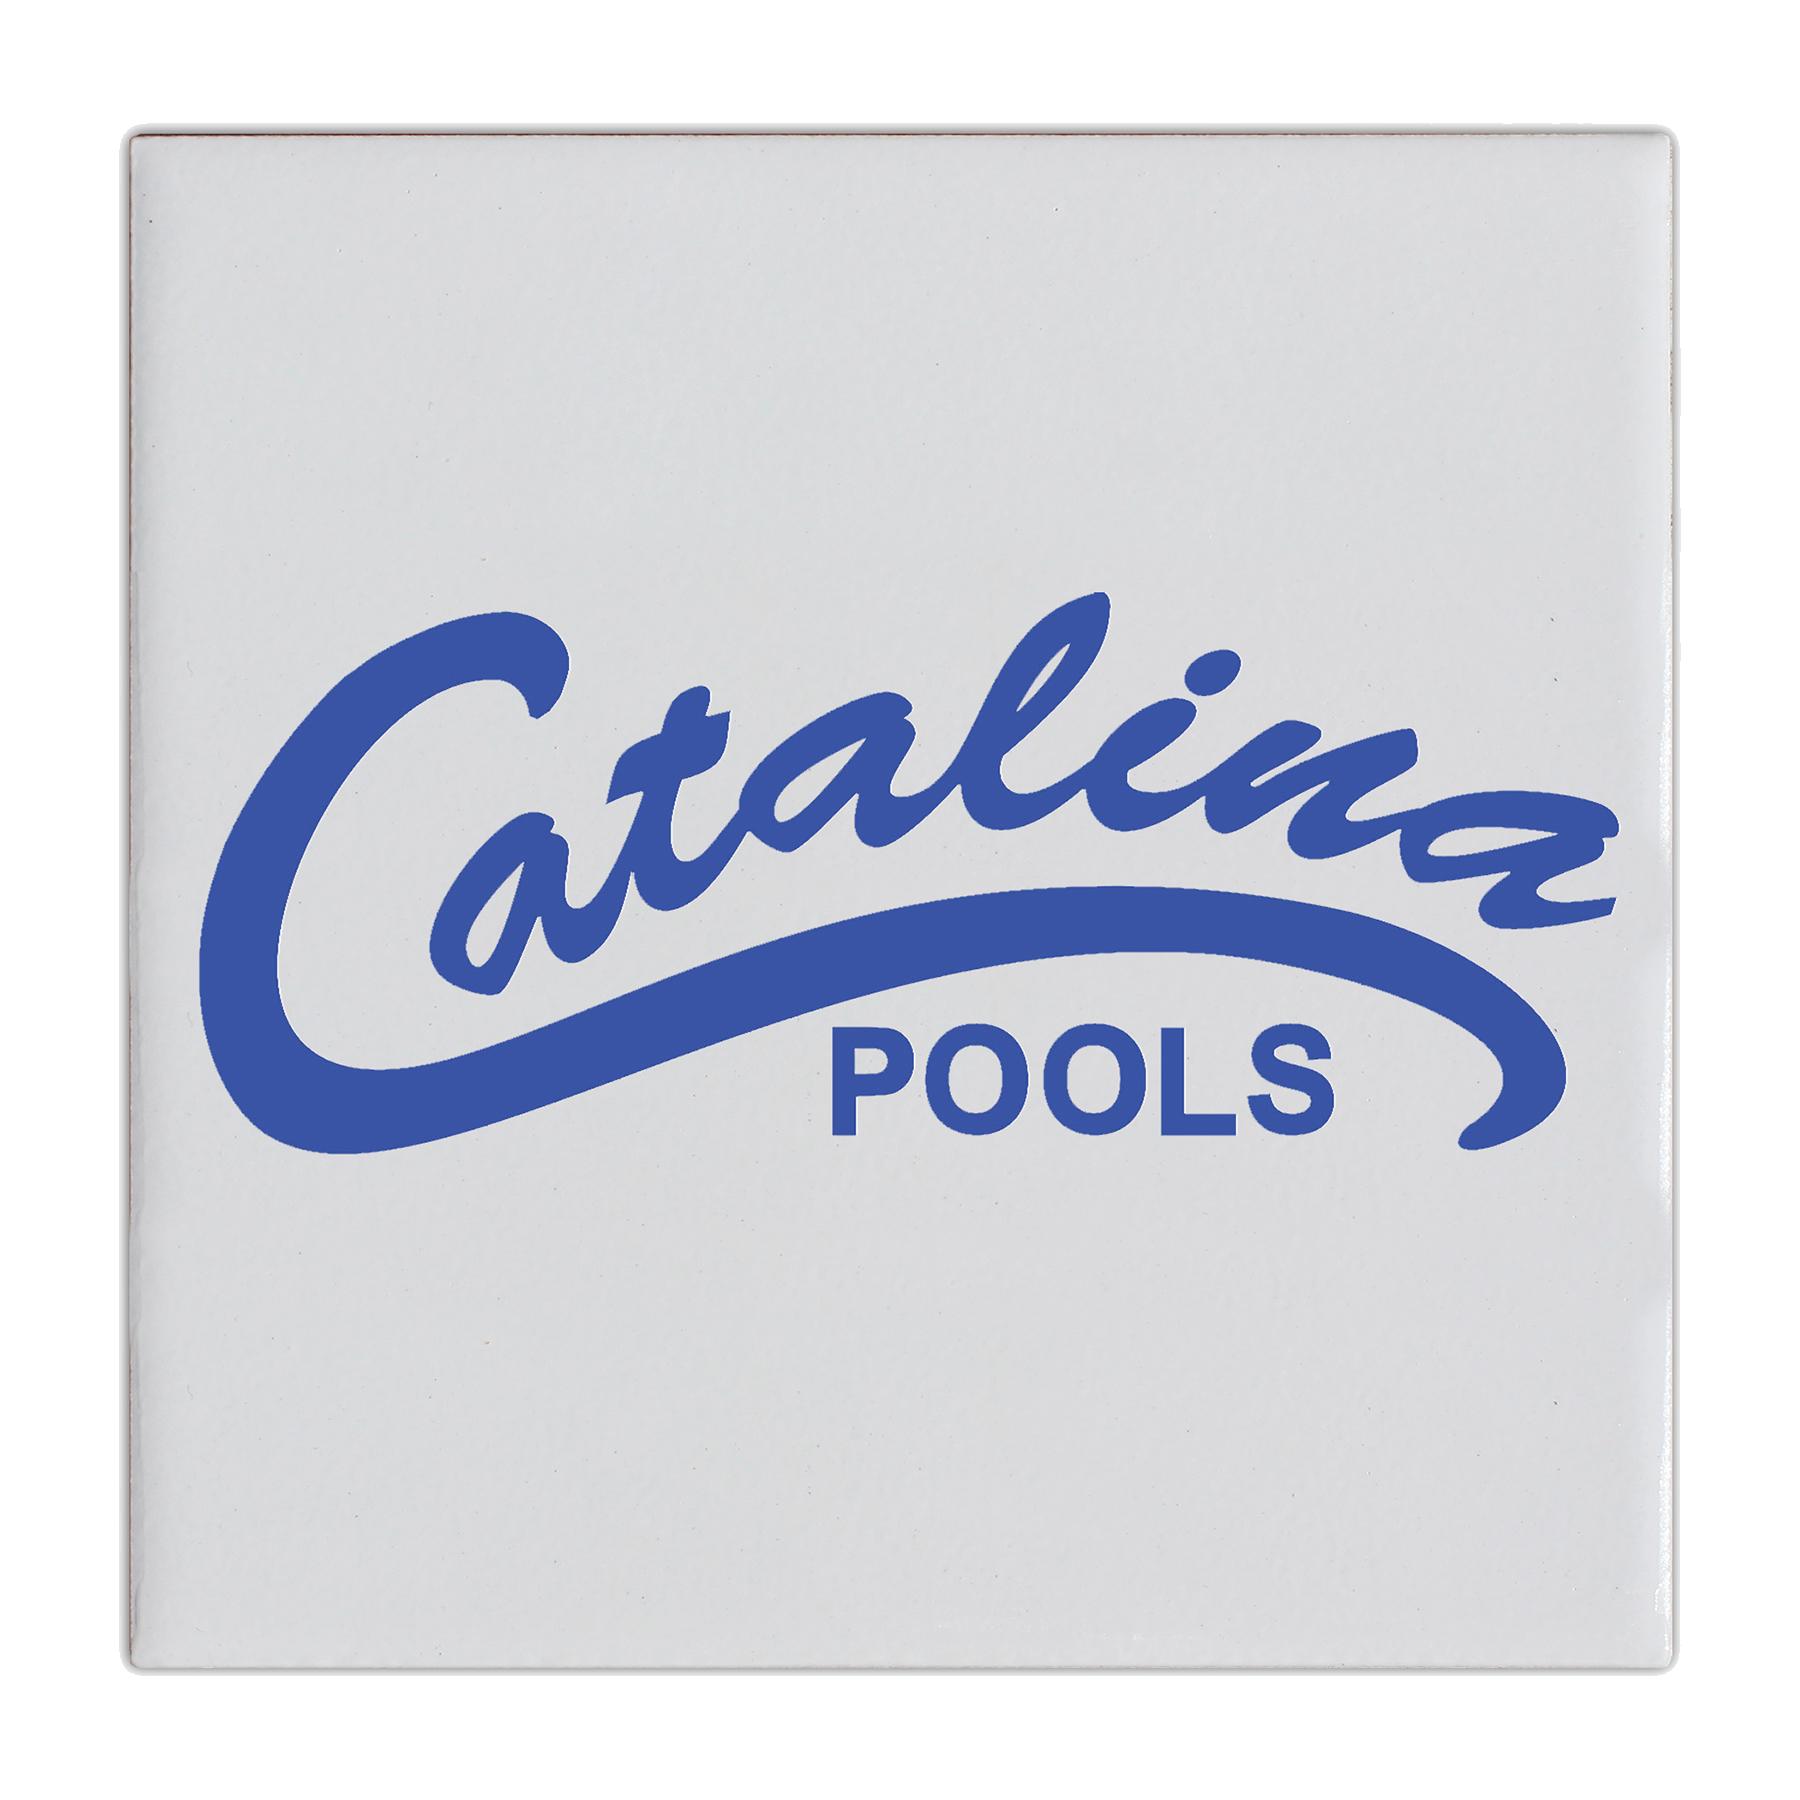 Catalina pools.png